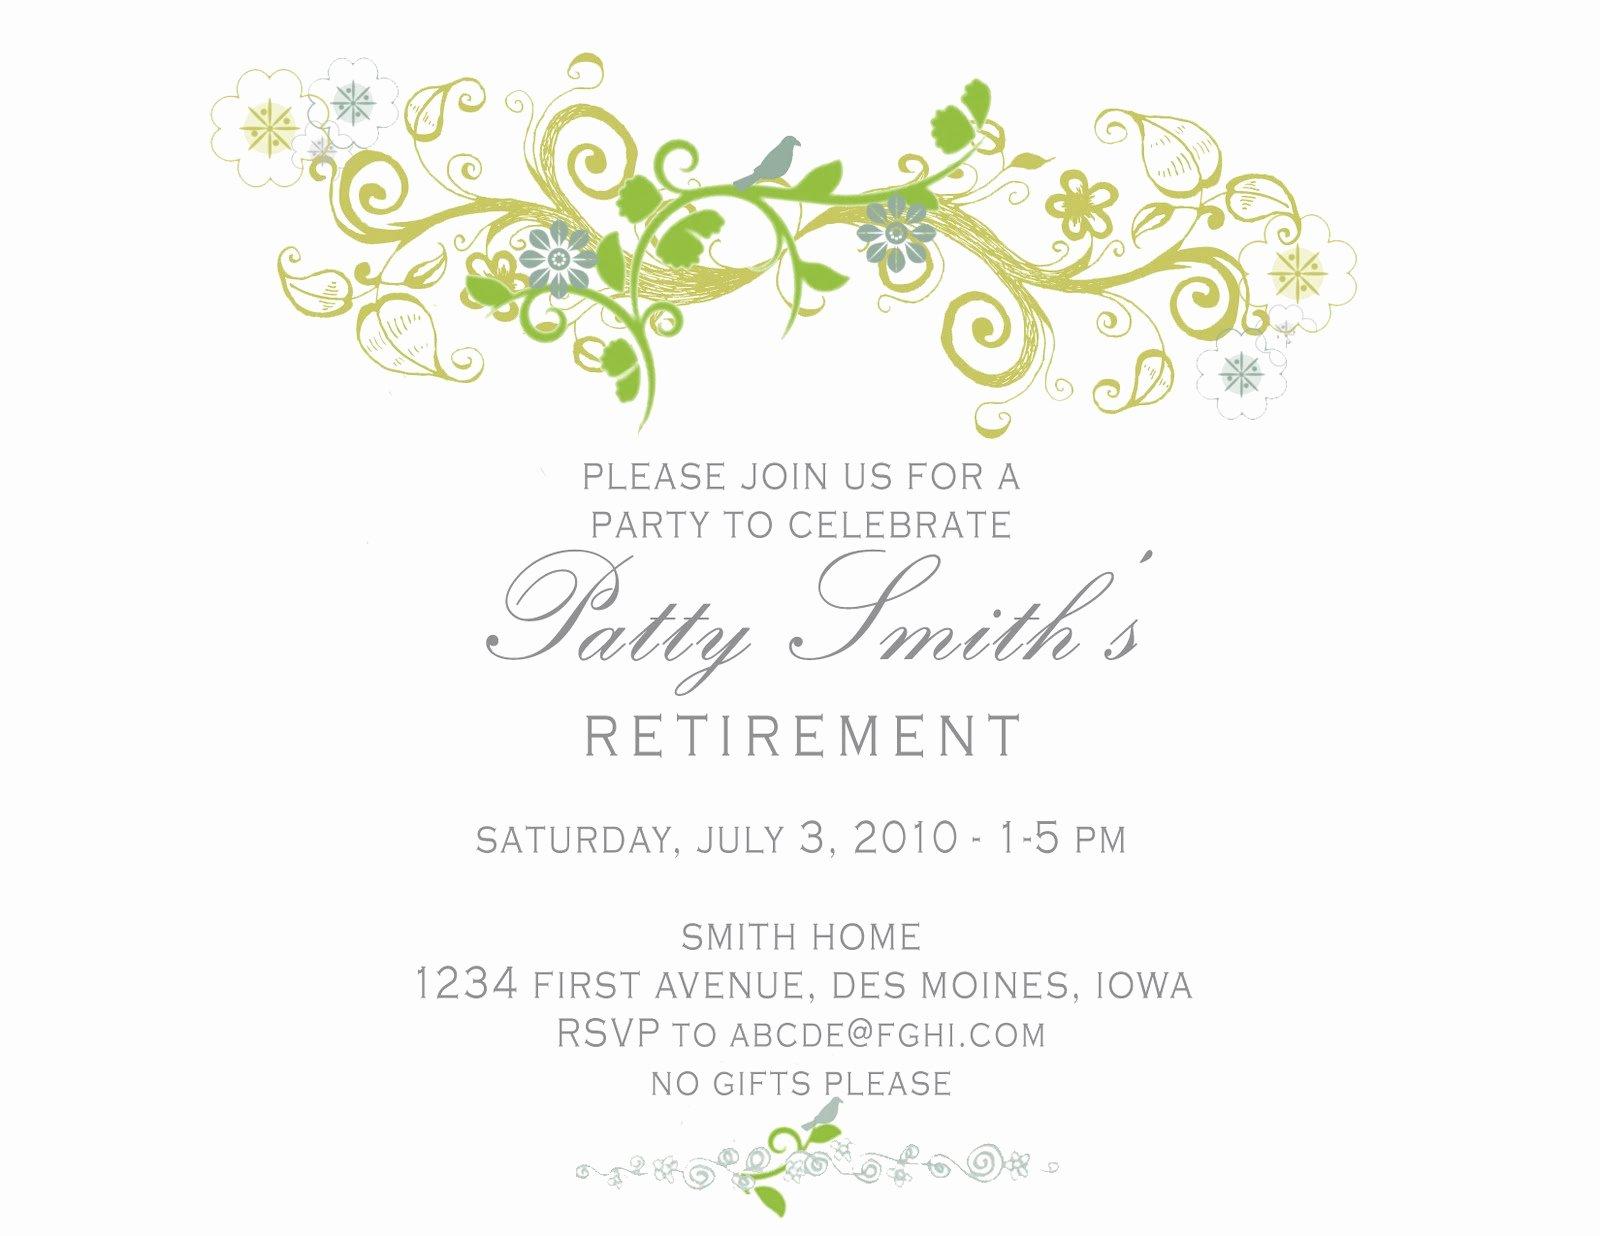 Retirement Party Invitation Templates New Idesign A Retirement Party Invitation